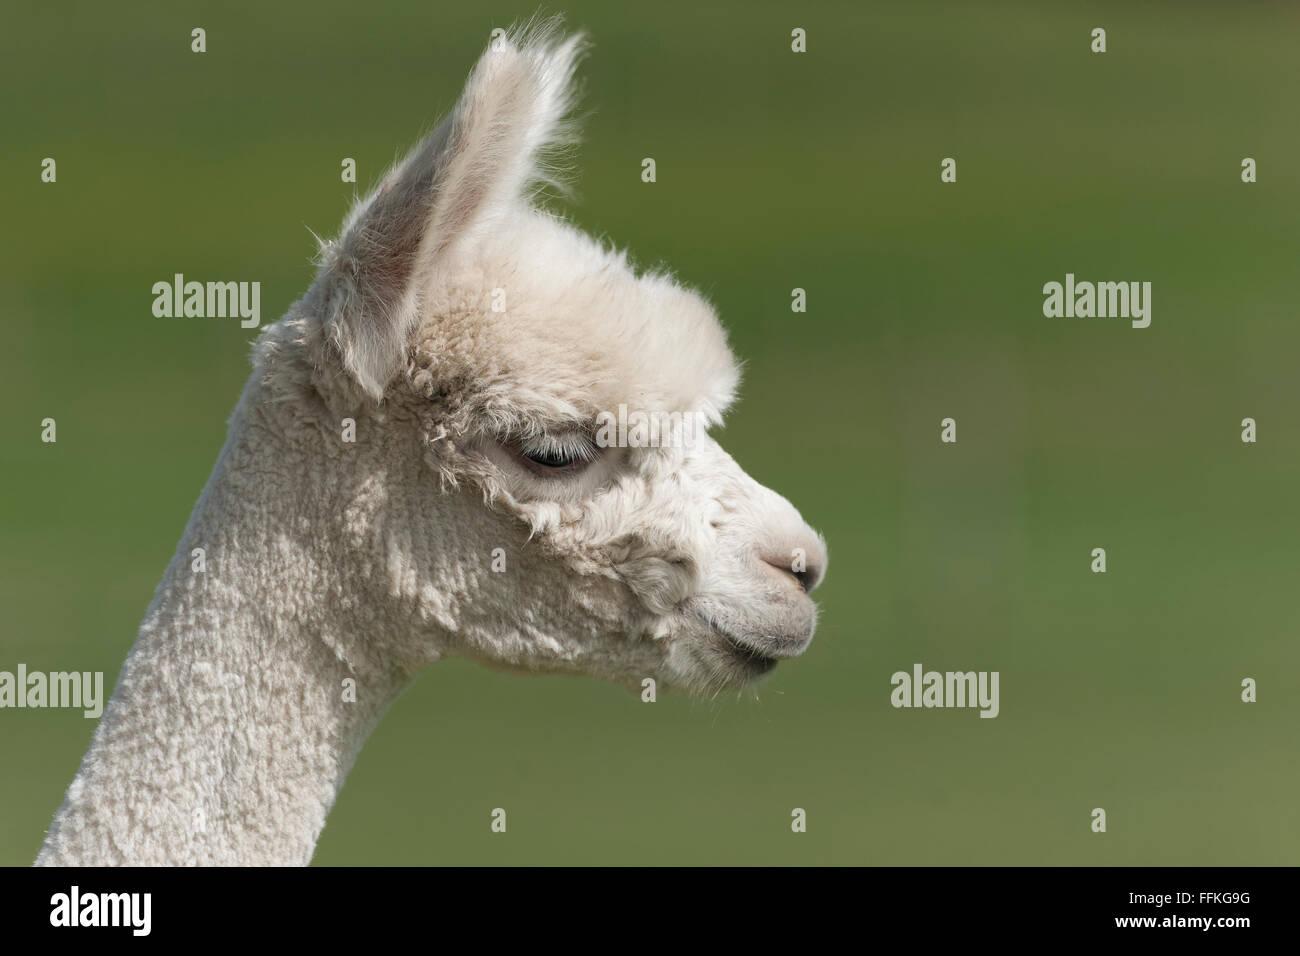 Alpaca portrait - smaller animal than the Llama - Stock Image